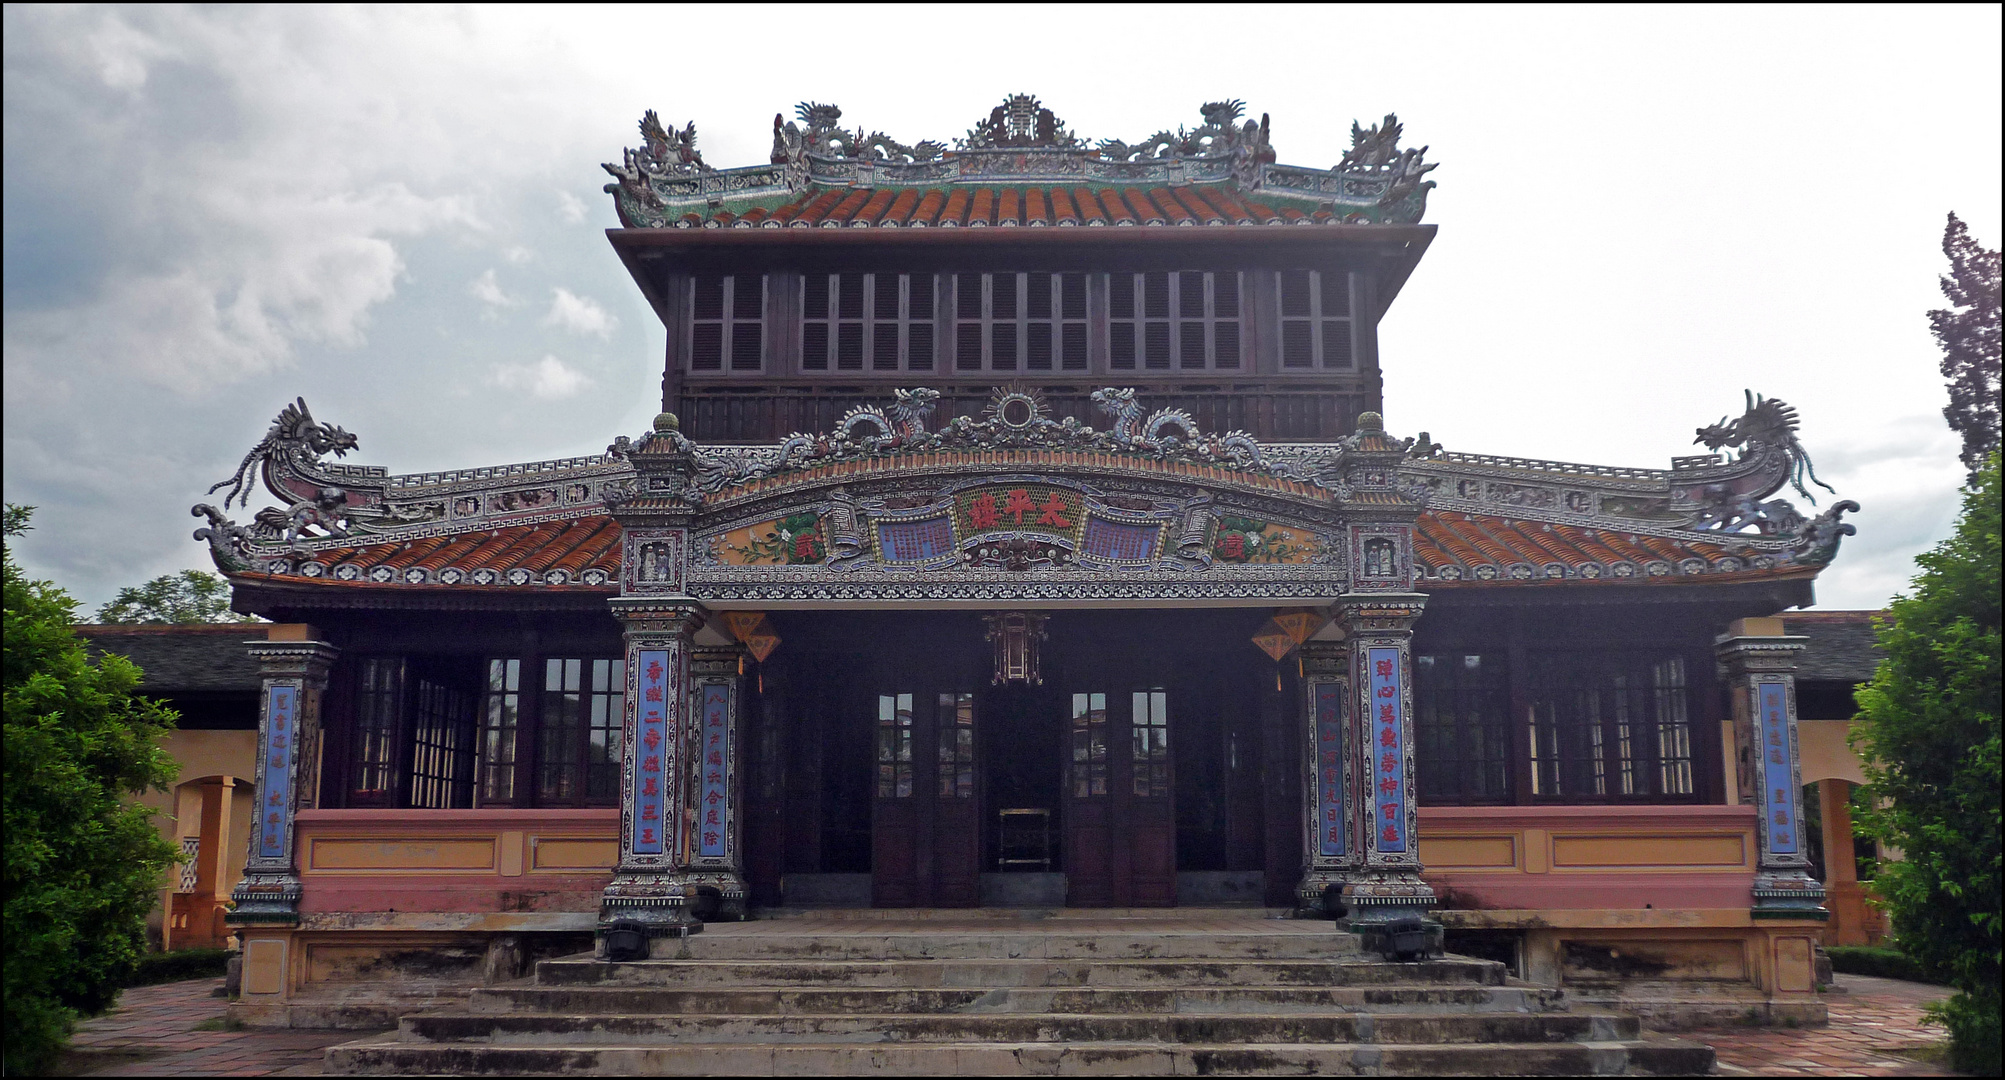 VIETNAM - Hue - Cittadella imperiale